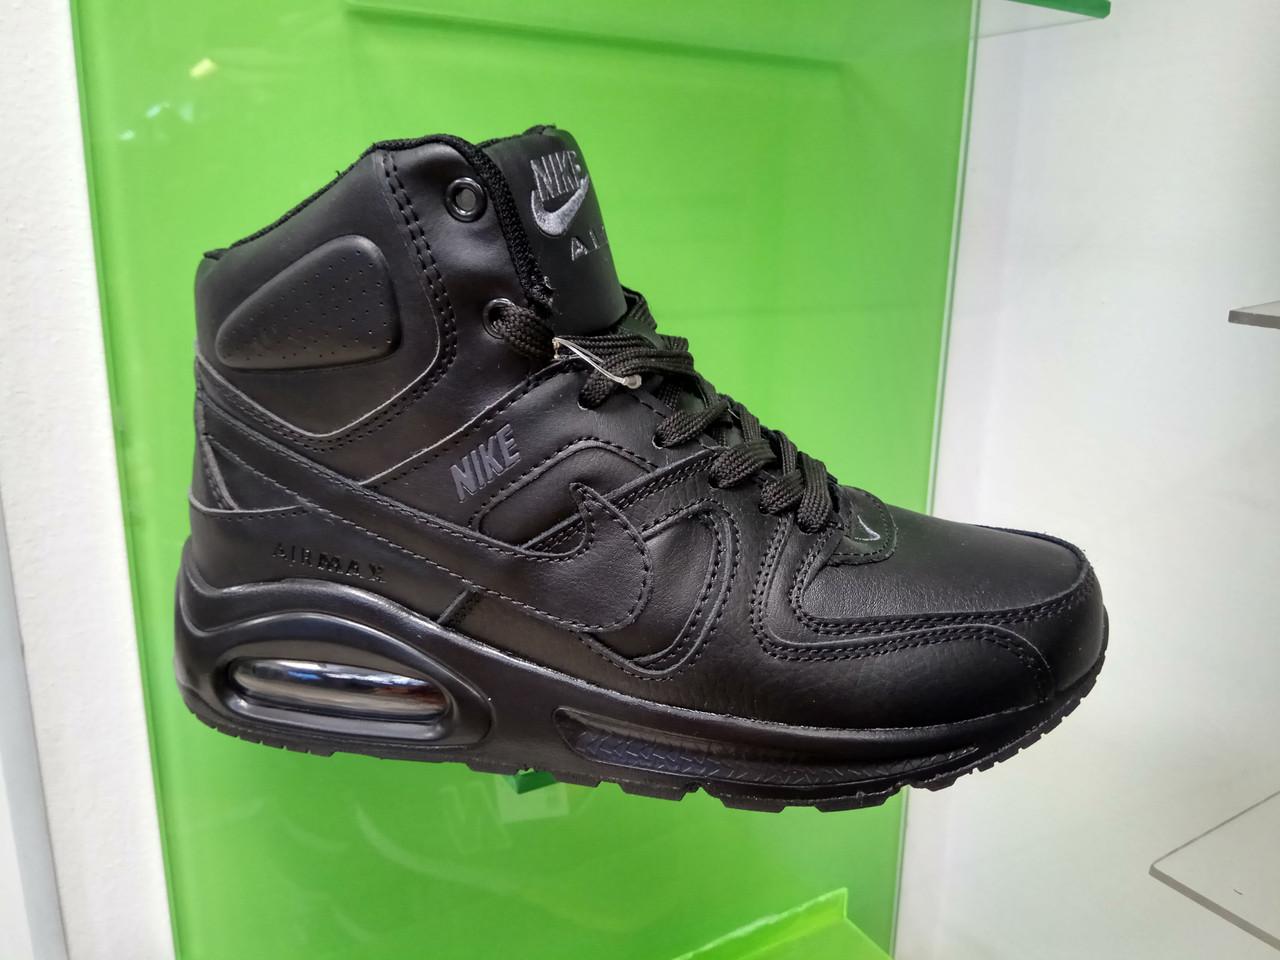 4bba3a47 Женские и подростковые зимние кроссовки Nike Air Max Winter Black -  Интернет магазин krossovkiweb.kiev